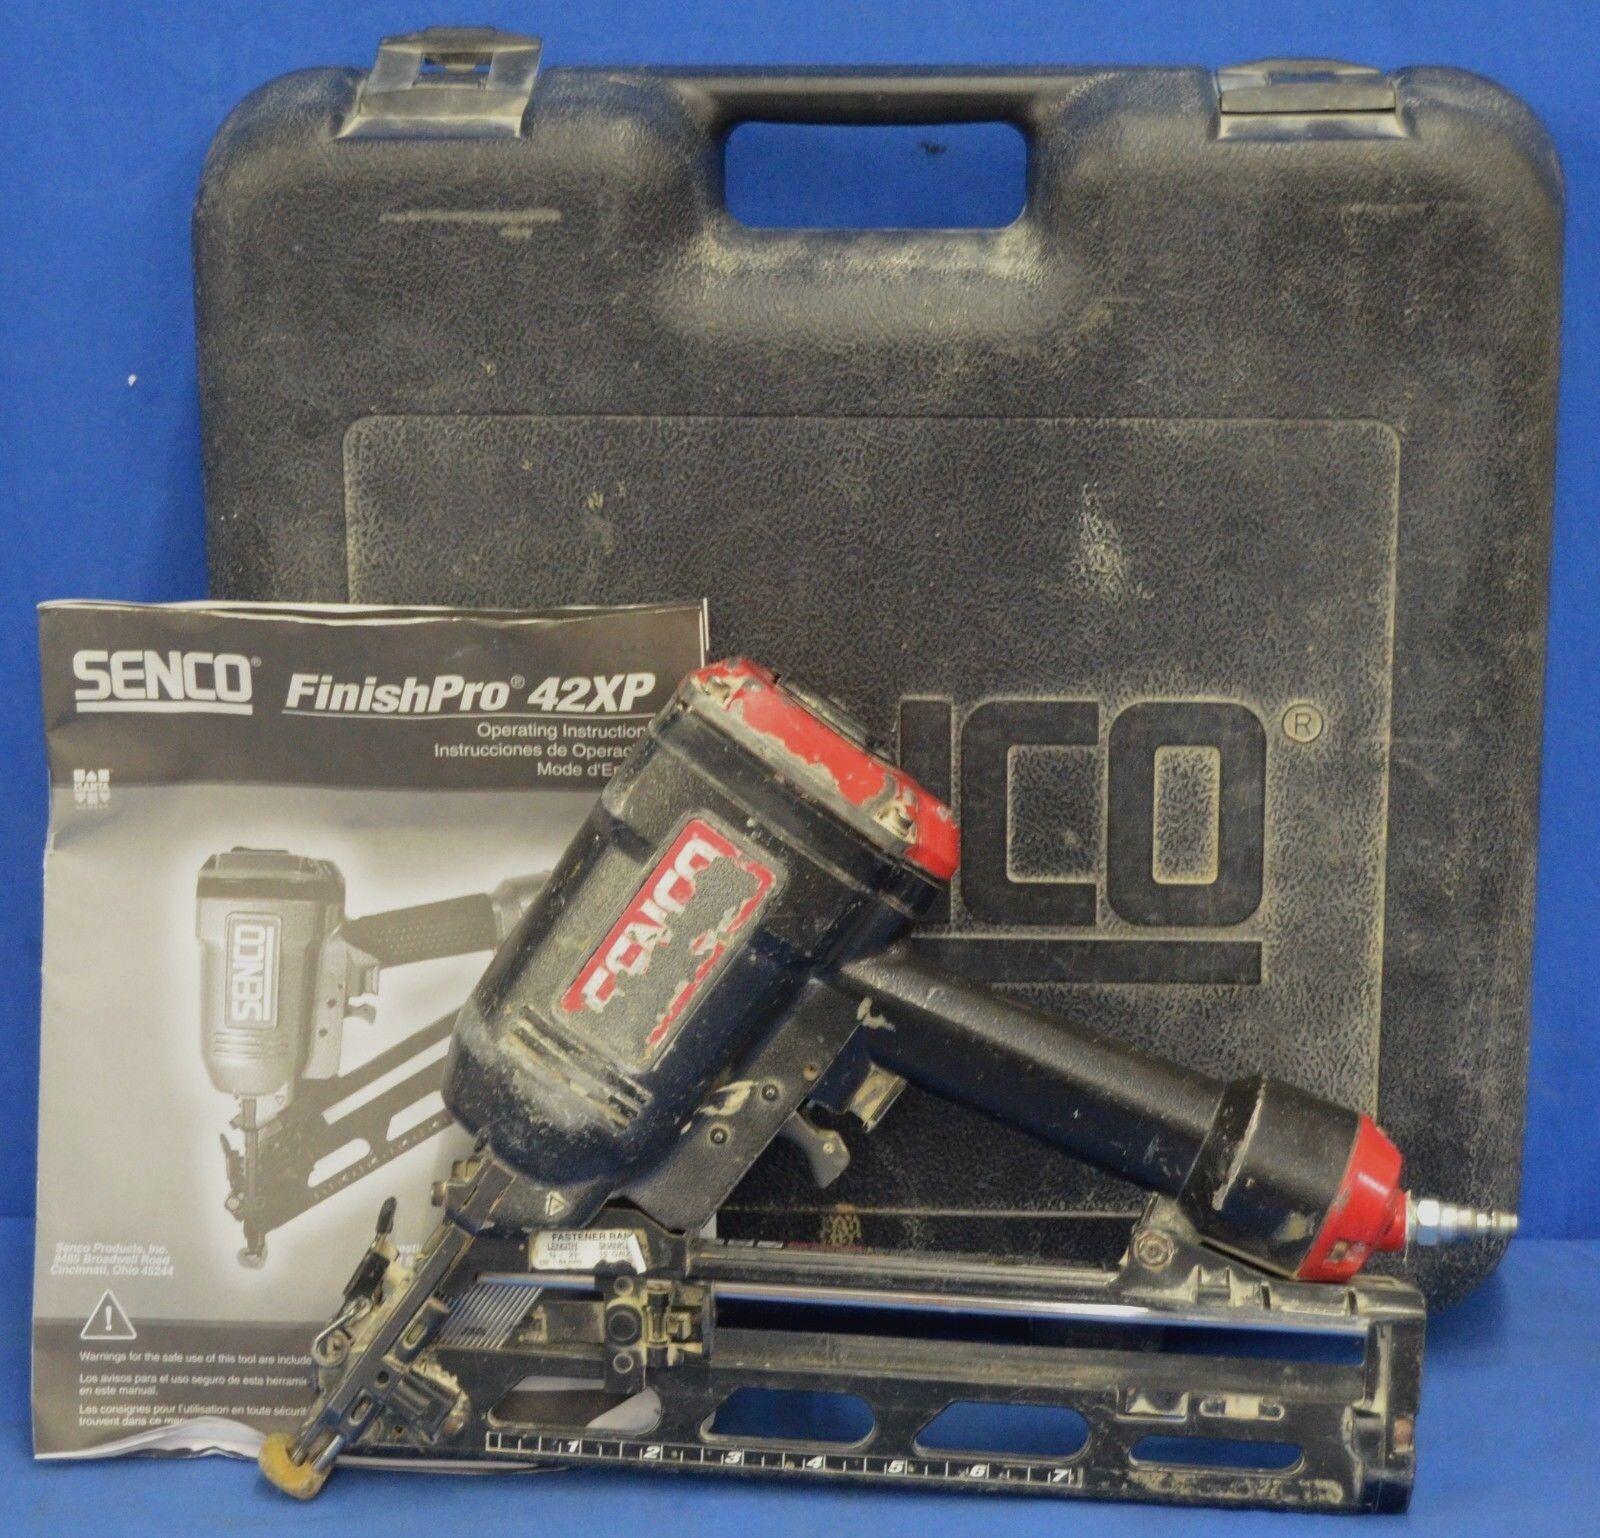 SENCO FC0219 2-1 2 Inch 15 Gauge Finish Nailer